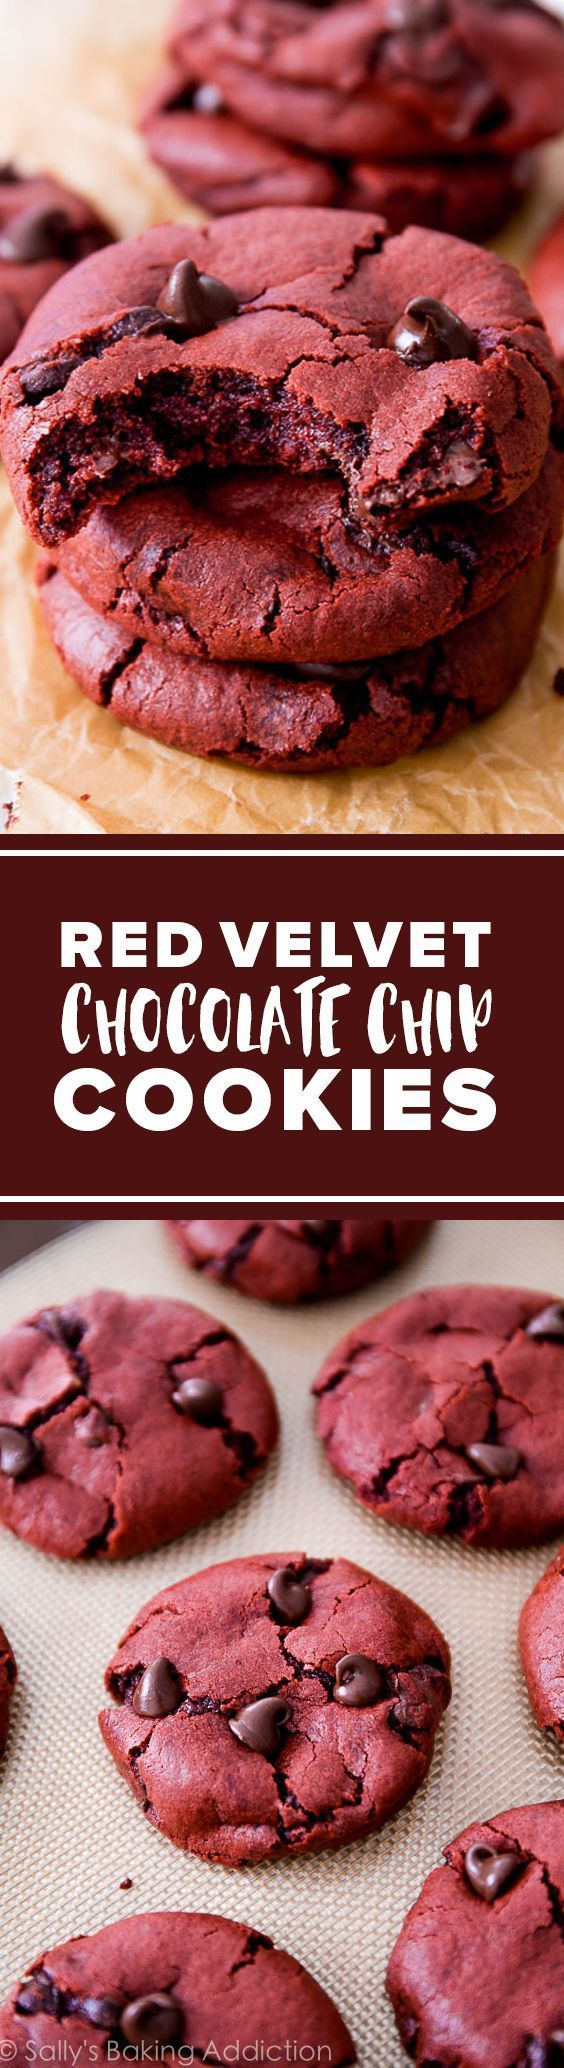 Soft and chewy red velvet cake chocolate chip cookies! Easy chocolate cookies recipe sallysbakingaddic...